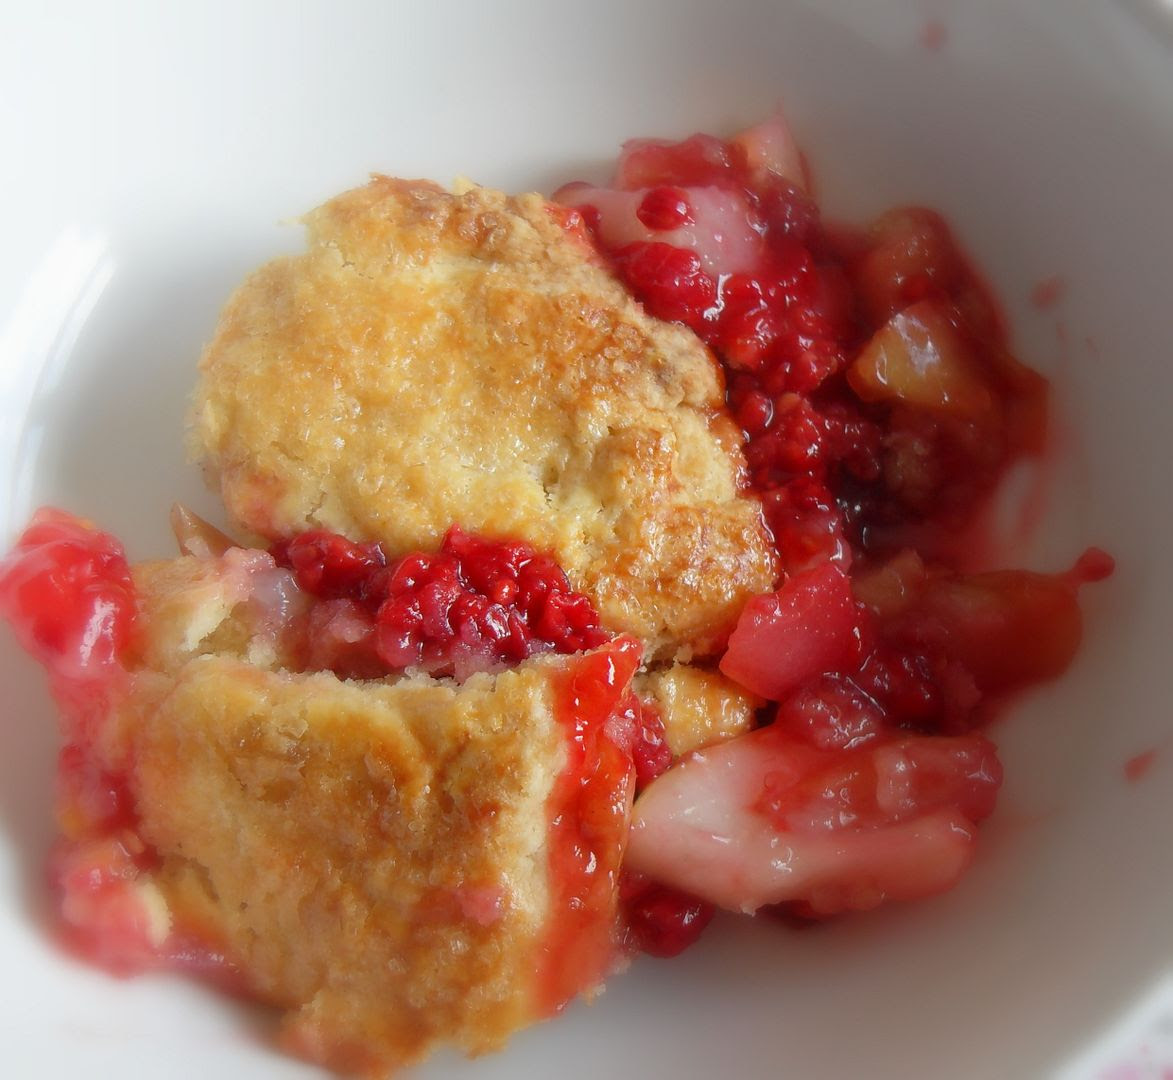 Gingered Pear and Raspberry Pandowdy